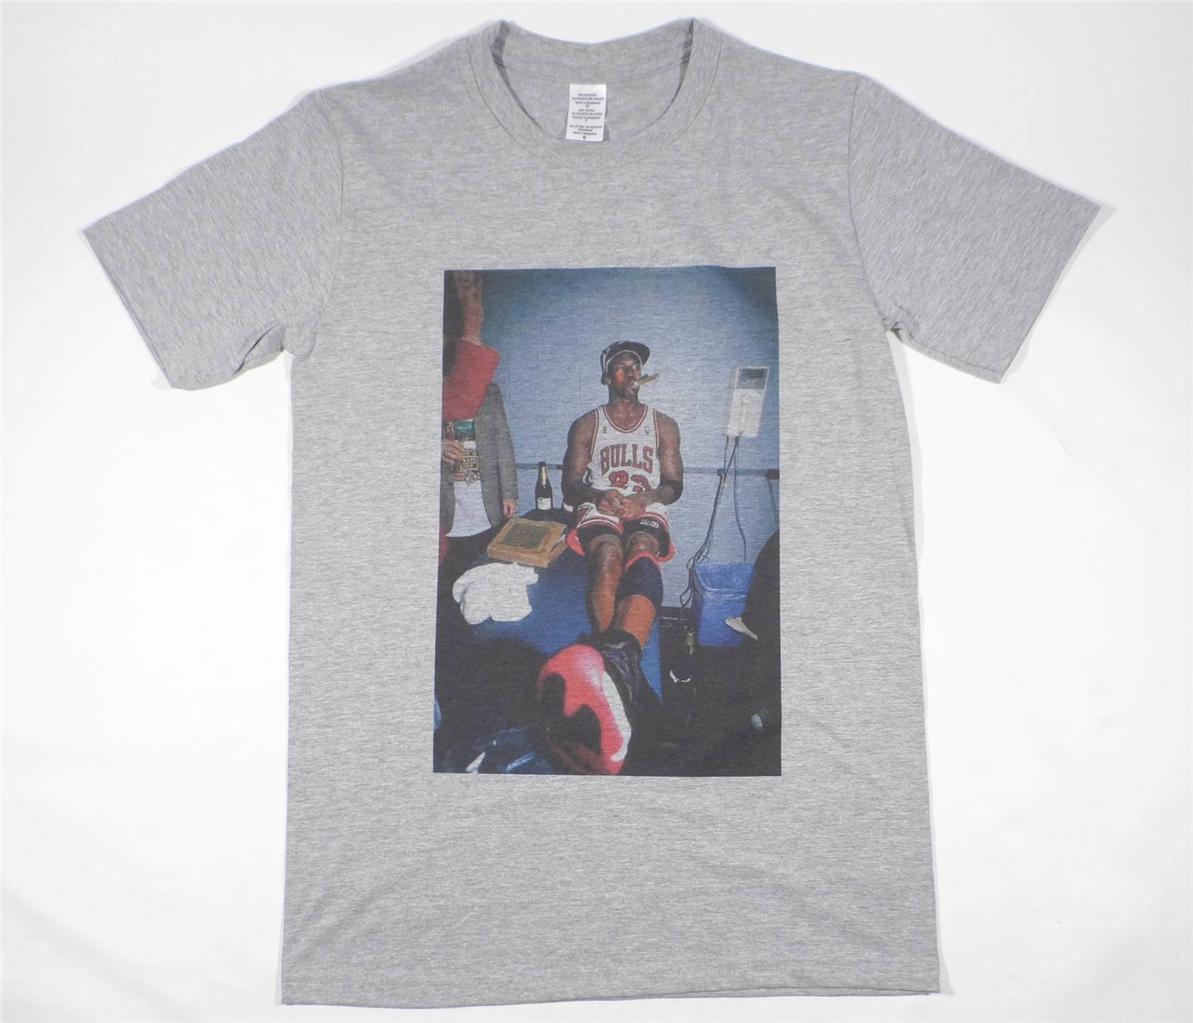 Michael jordan gris t-shirt taille xxxl supreme basketball bred championnat